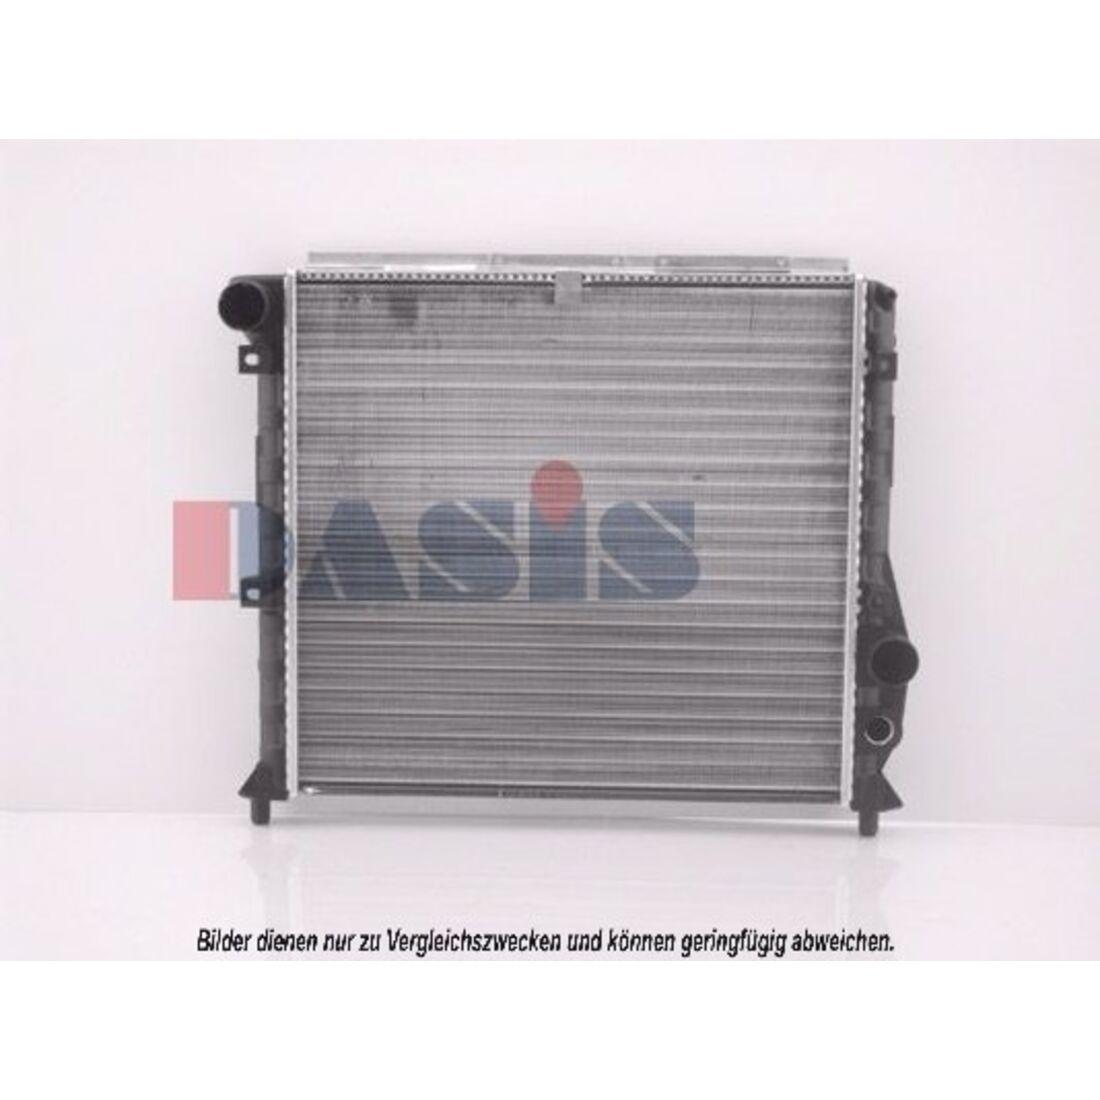 Kühler, Motorkühlung -- AKS DASIS, ALFA ROMEO, 75 (162B), 90 (162)...